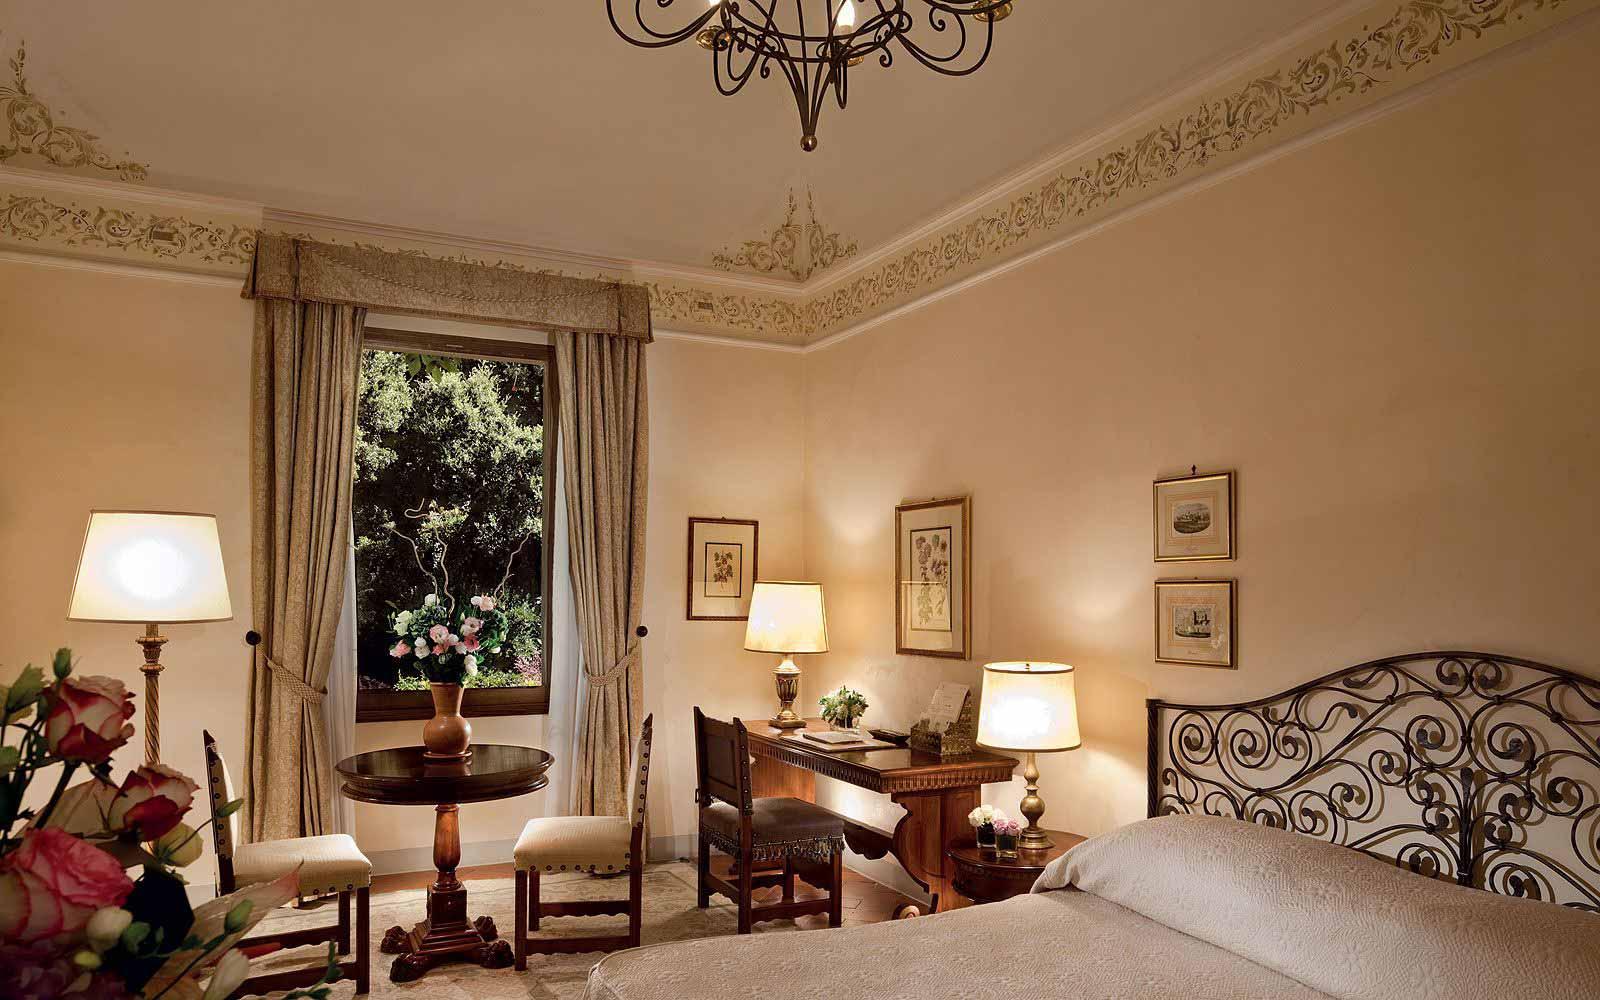 Deluxe Double Room at Belmond Villa San Michele